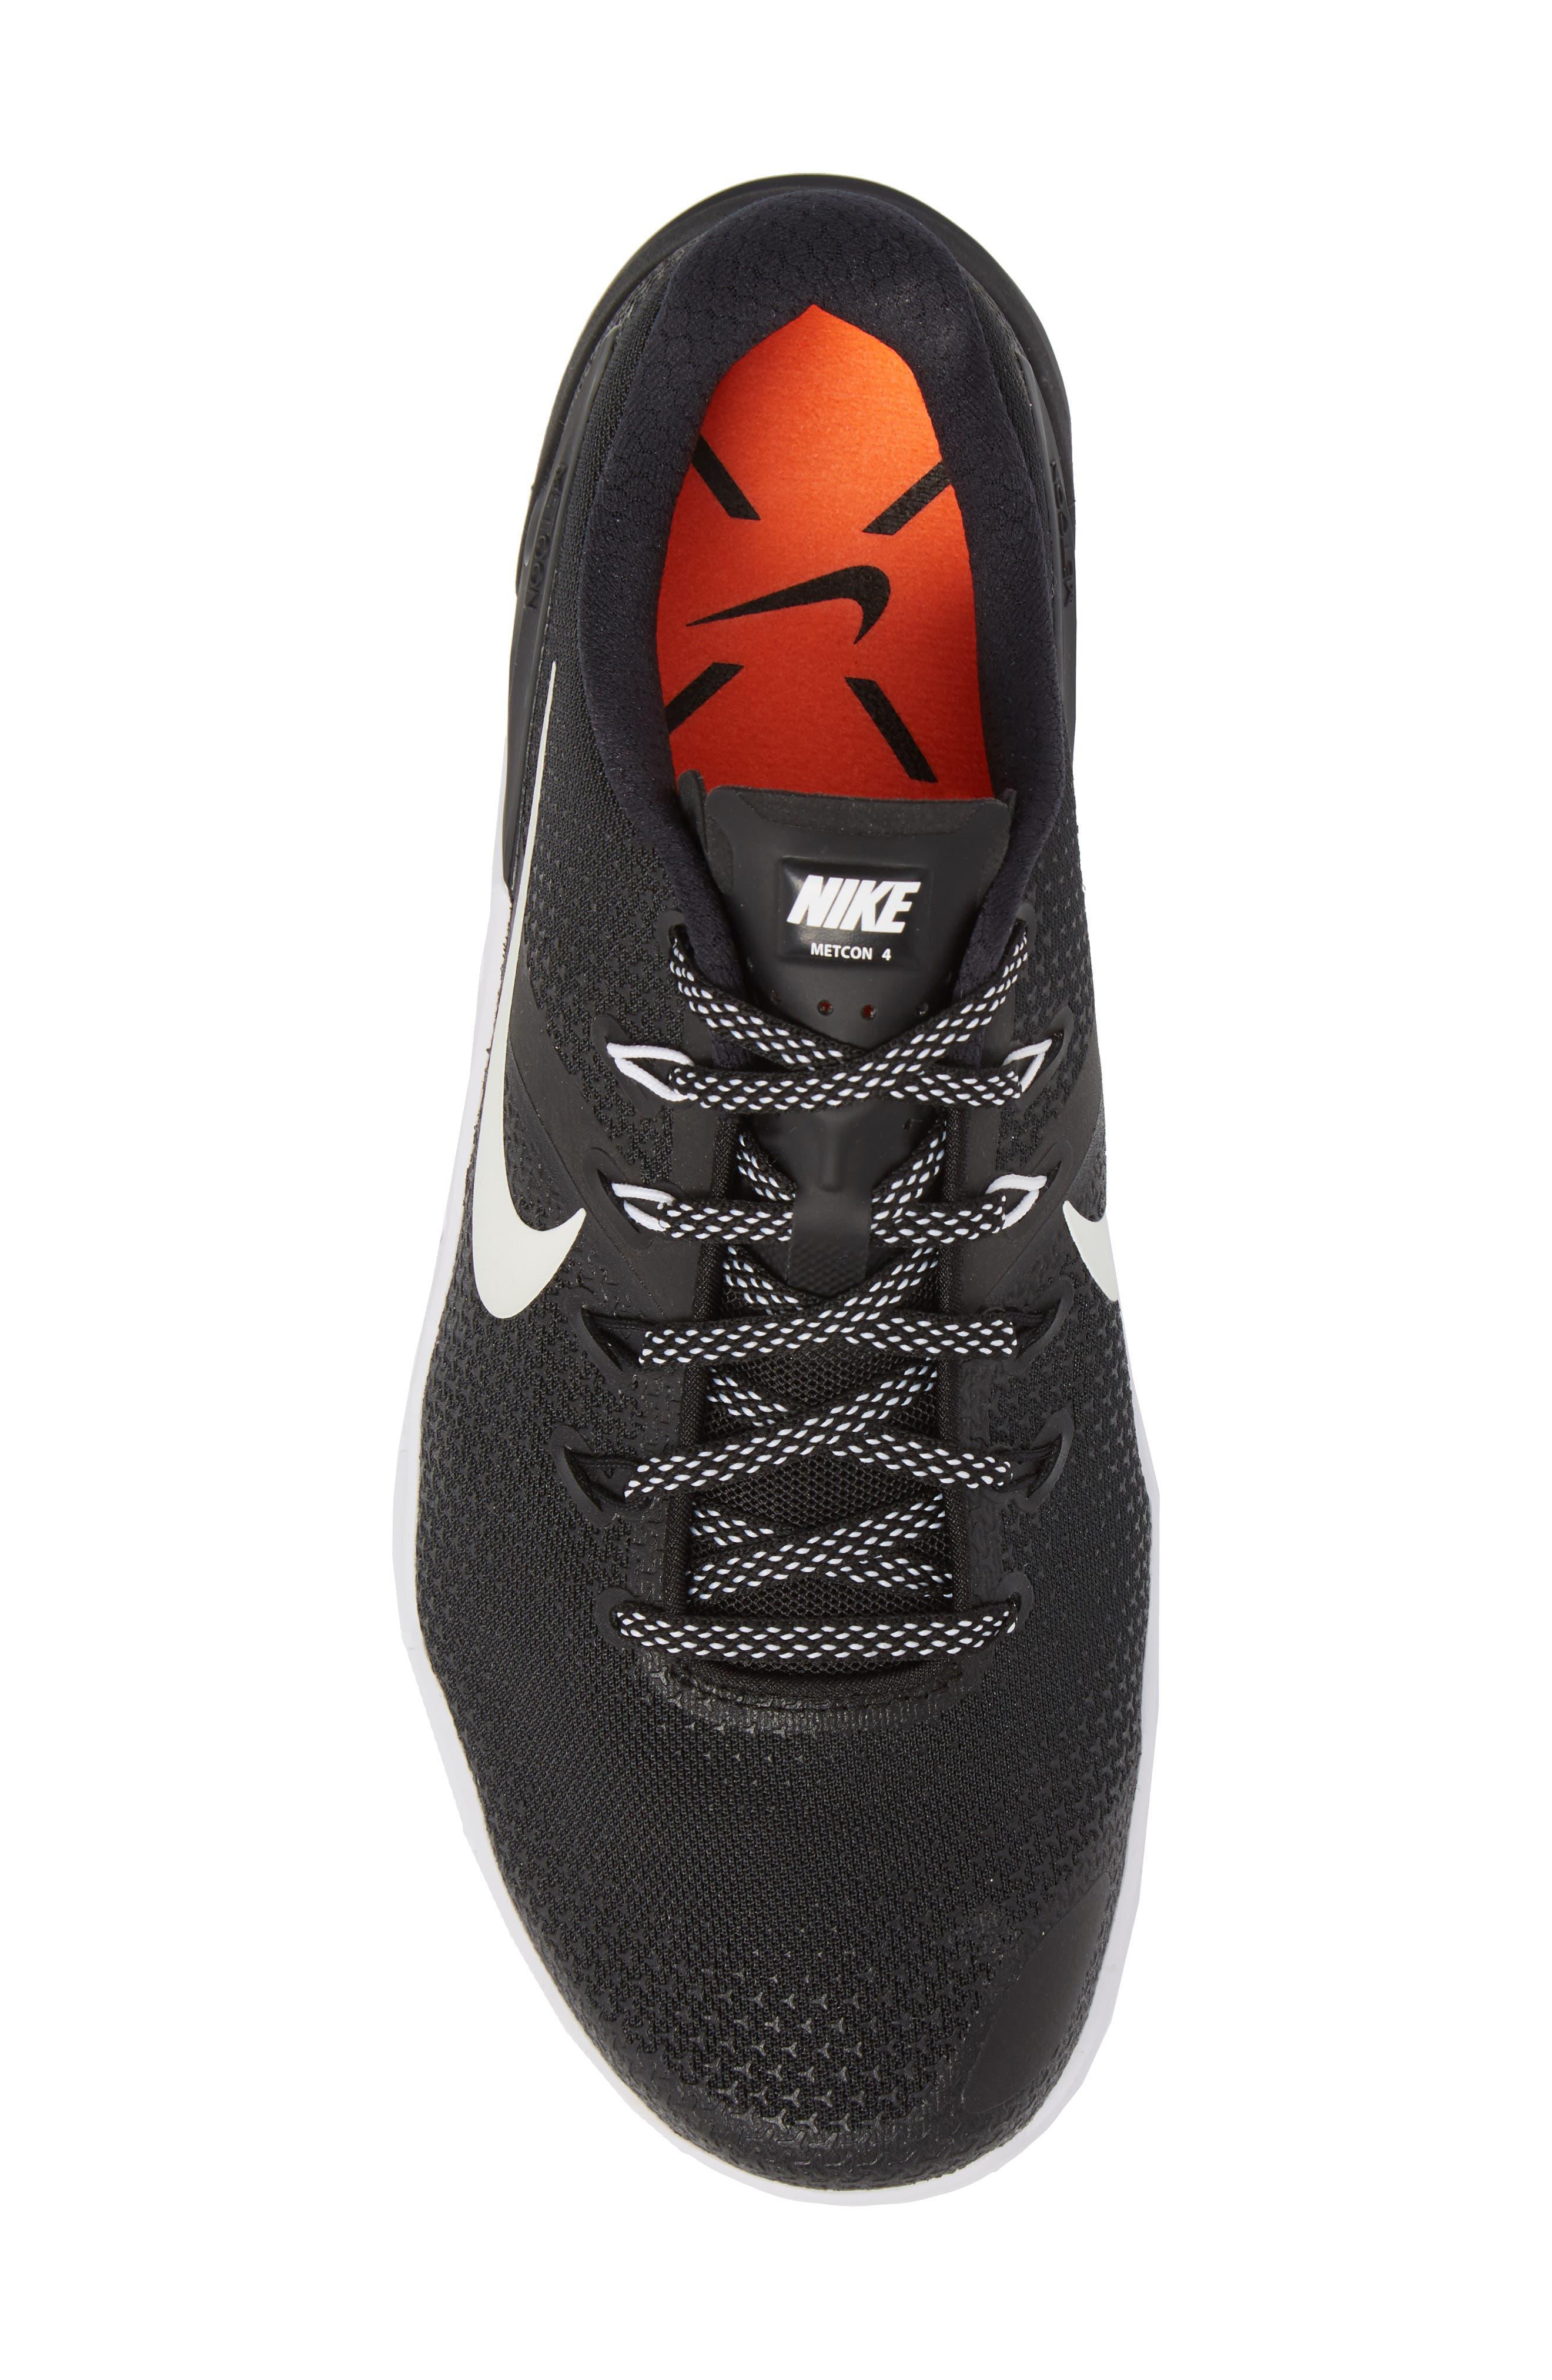 Metcon 4 Training Shoe,                             Alternate thumbnail 68, color,